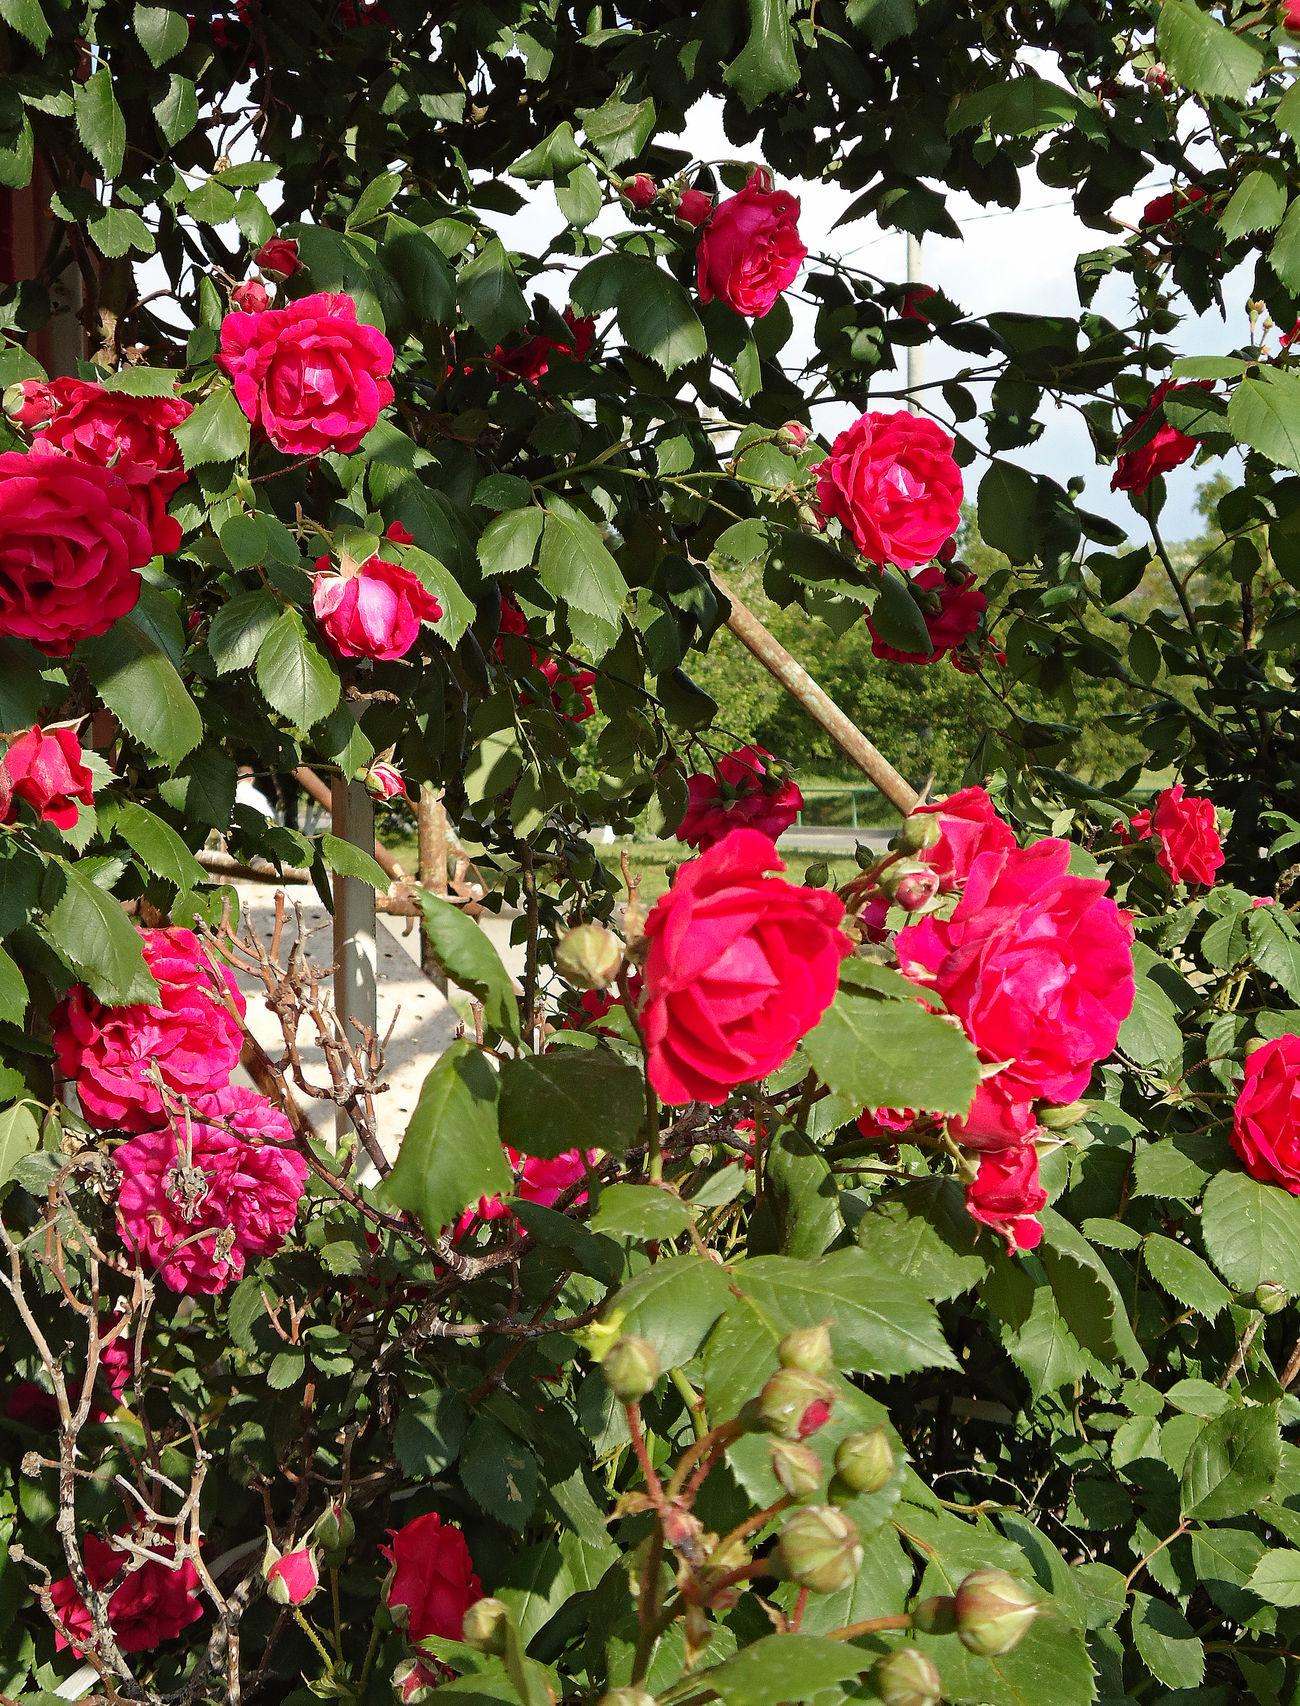 Novorossiysk Roses Blooms Bush Climbers Climbing Climbing Roses Clusters Exuberant Flourishing Flowers Garden Garden Flowers Garden Roses Hedge Lush Foliage Ramblers Rambling Rose Red Roses Rosas Rose Bush Roses Shrubs Spring Flowers Spring May Spring Roses